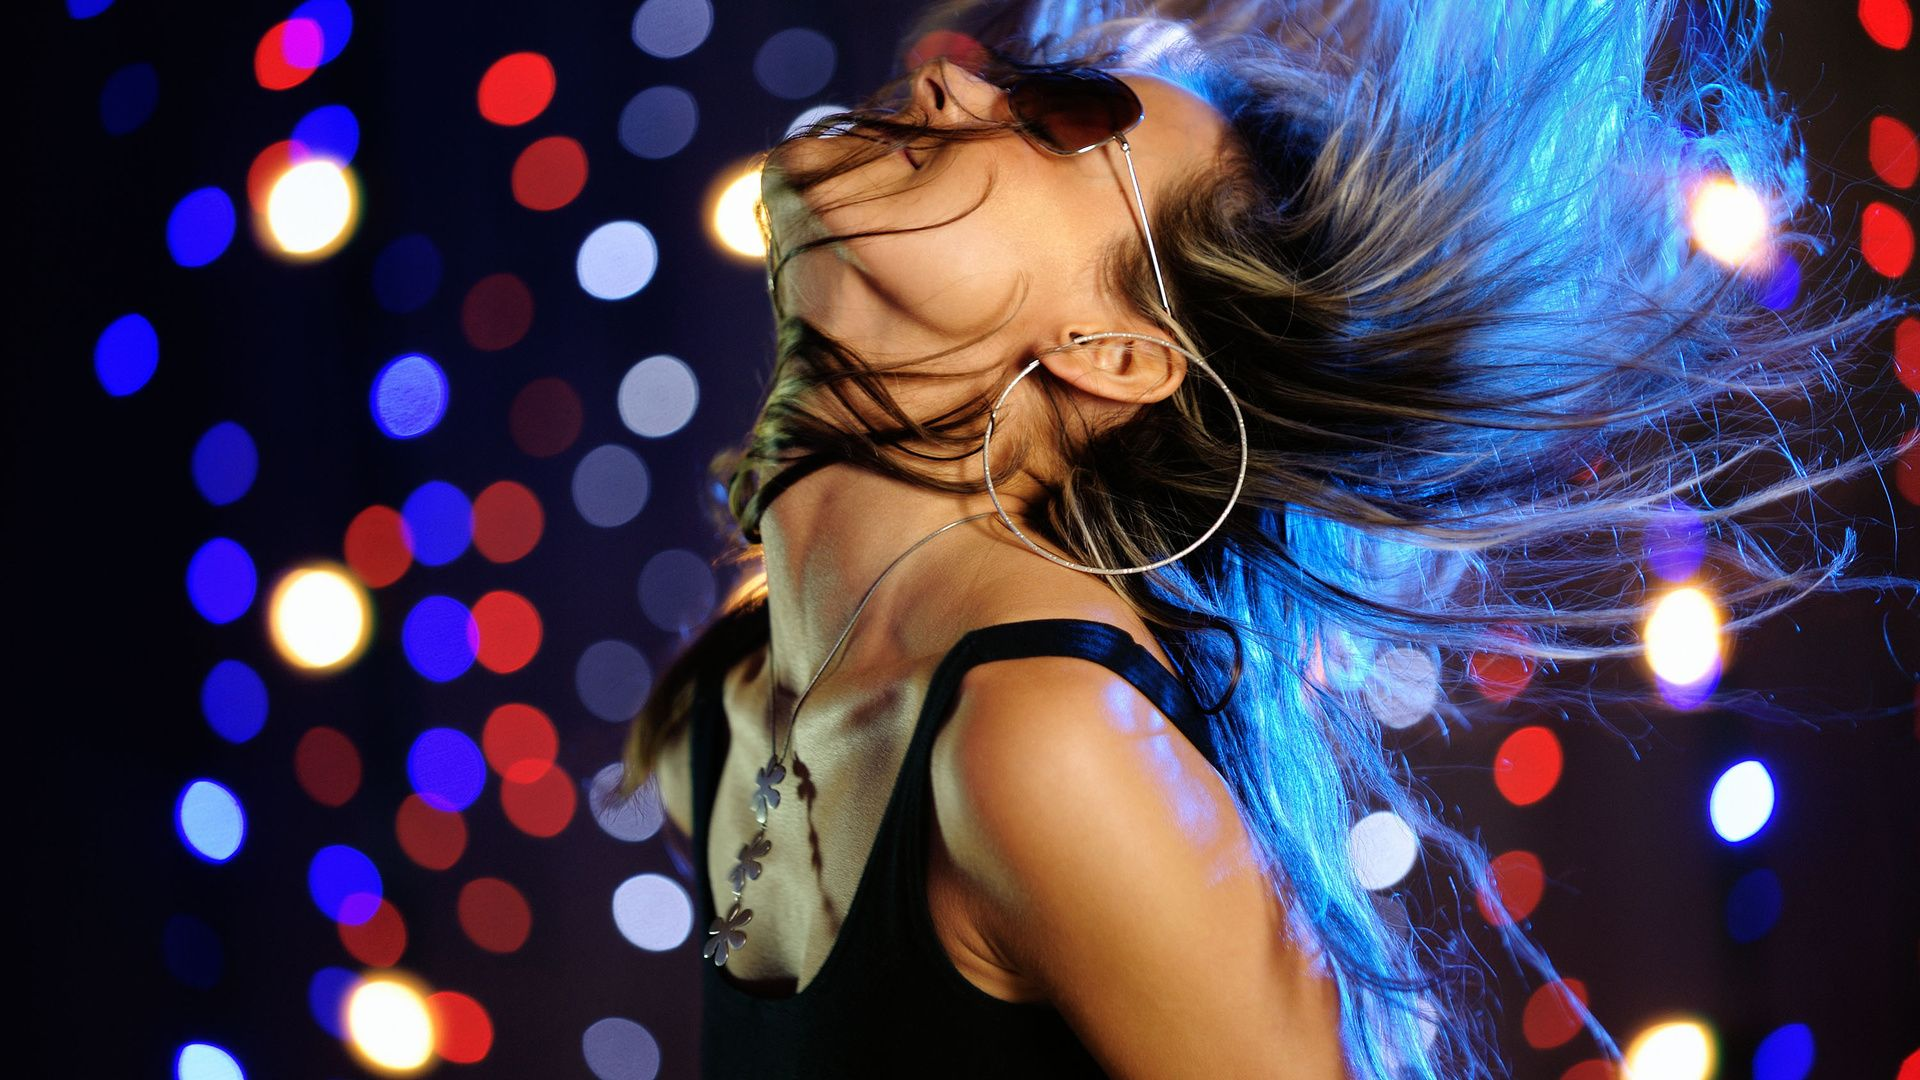 Dance full screen hd wallpaper